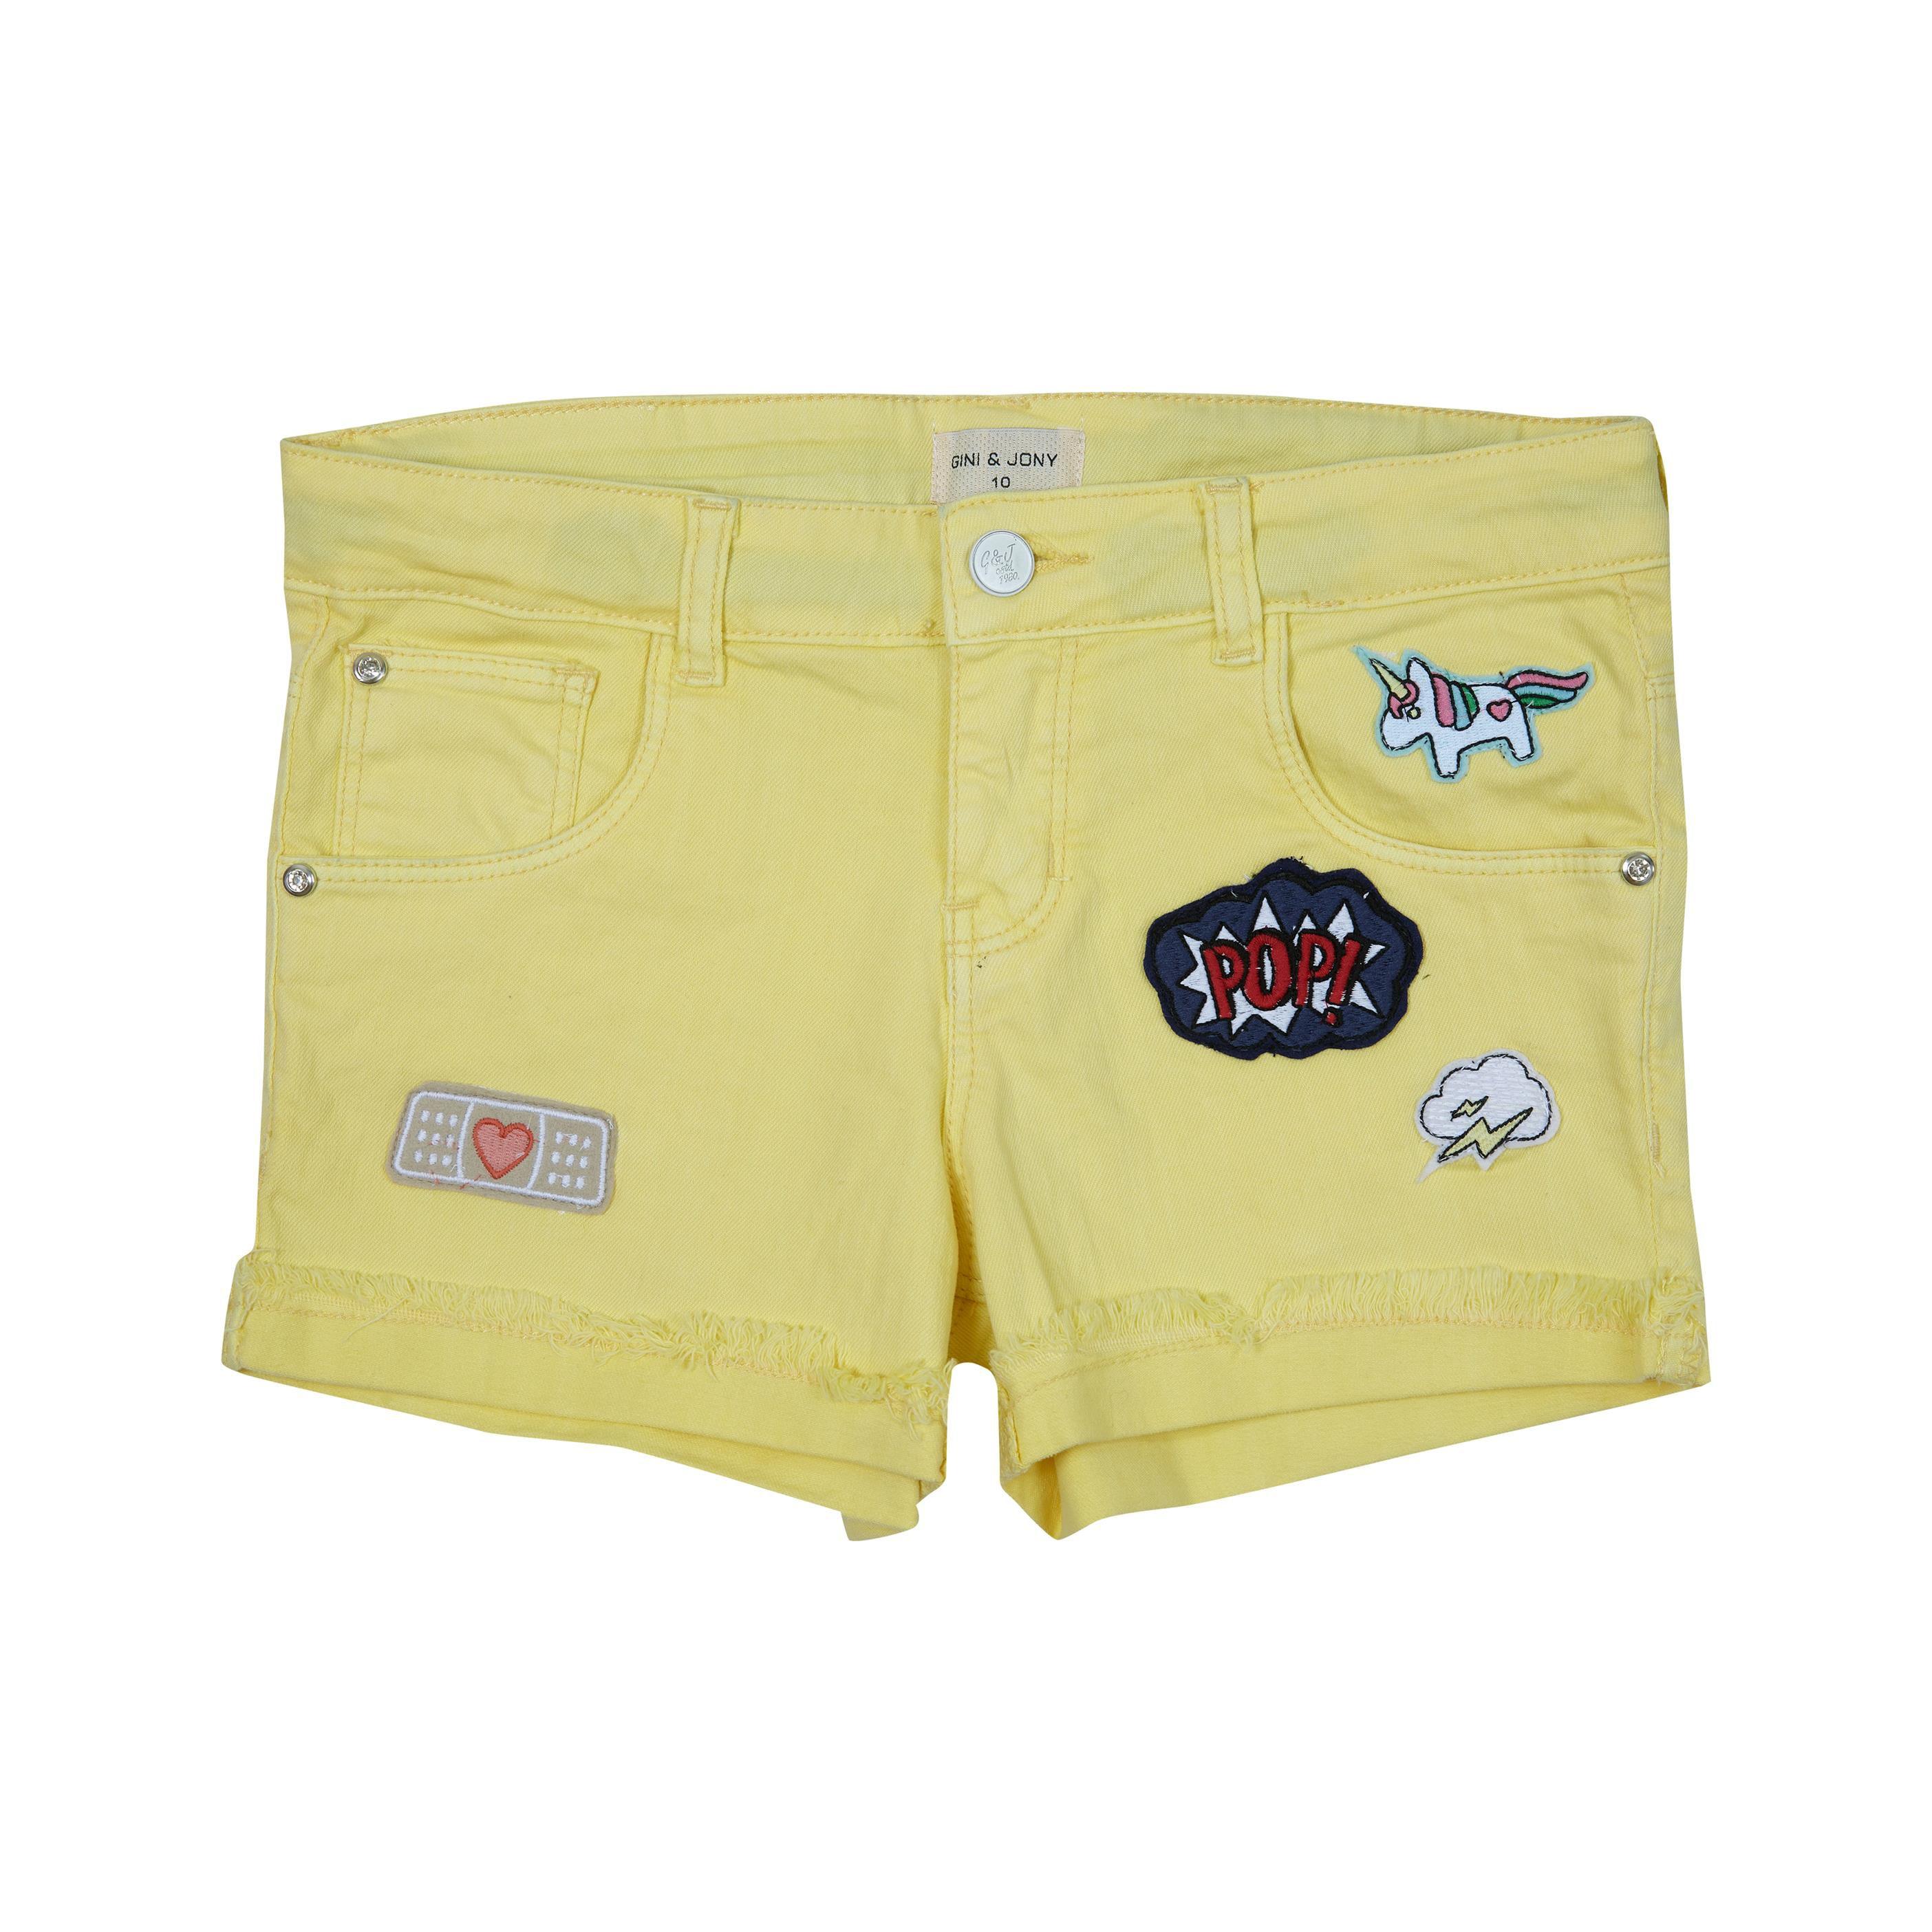 Gini & Jony Yellow  Shorts